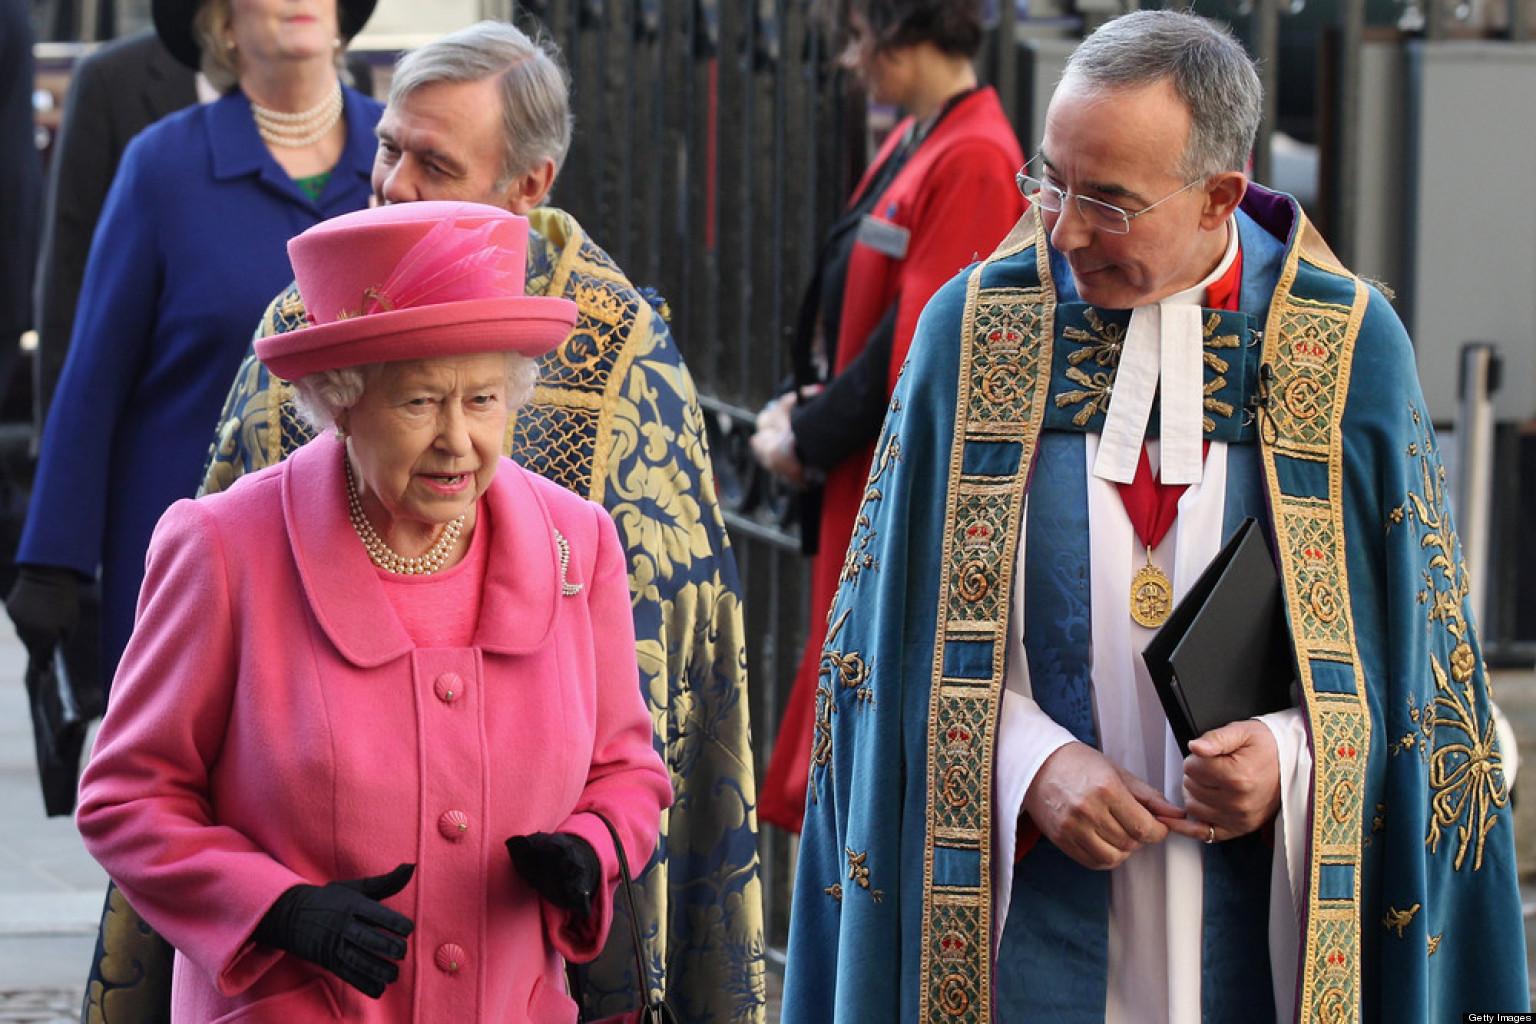 Royal Wedding Officiant Visits US